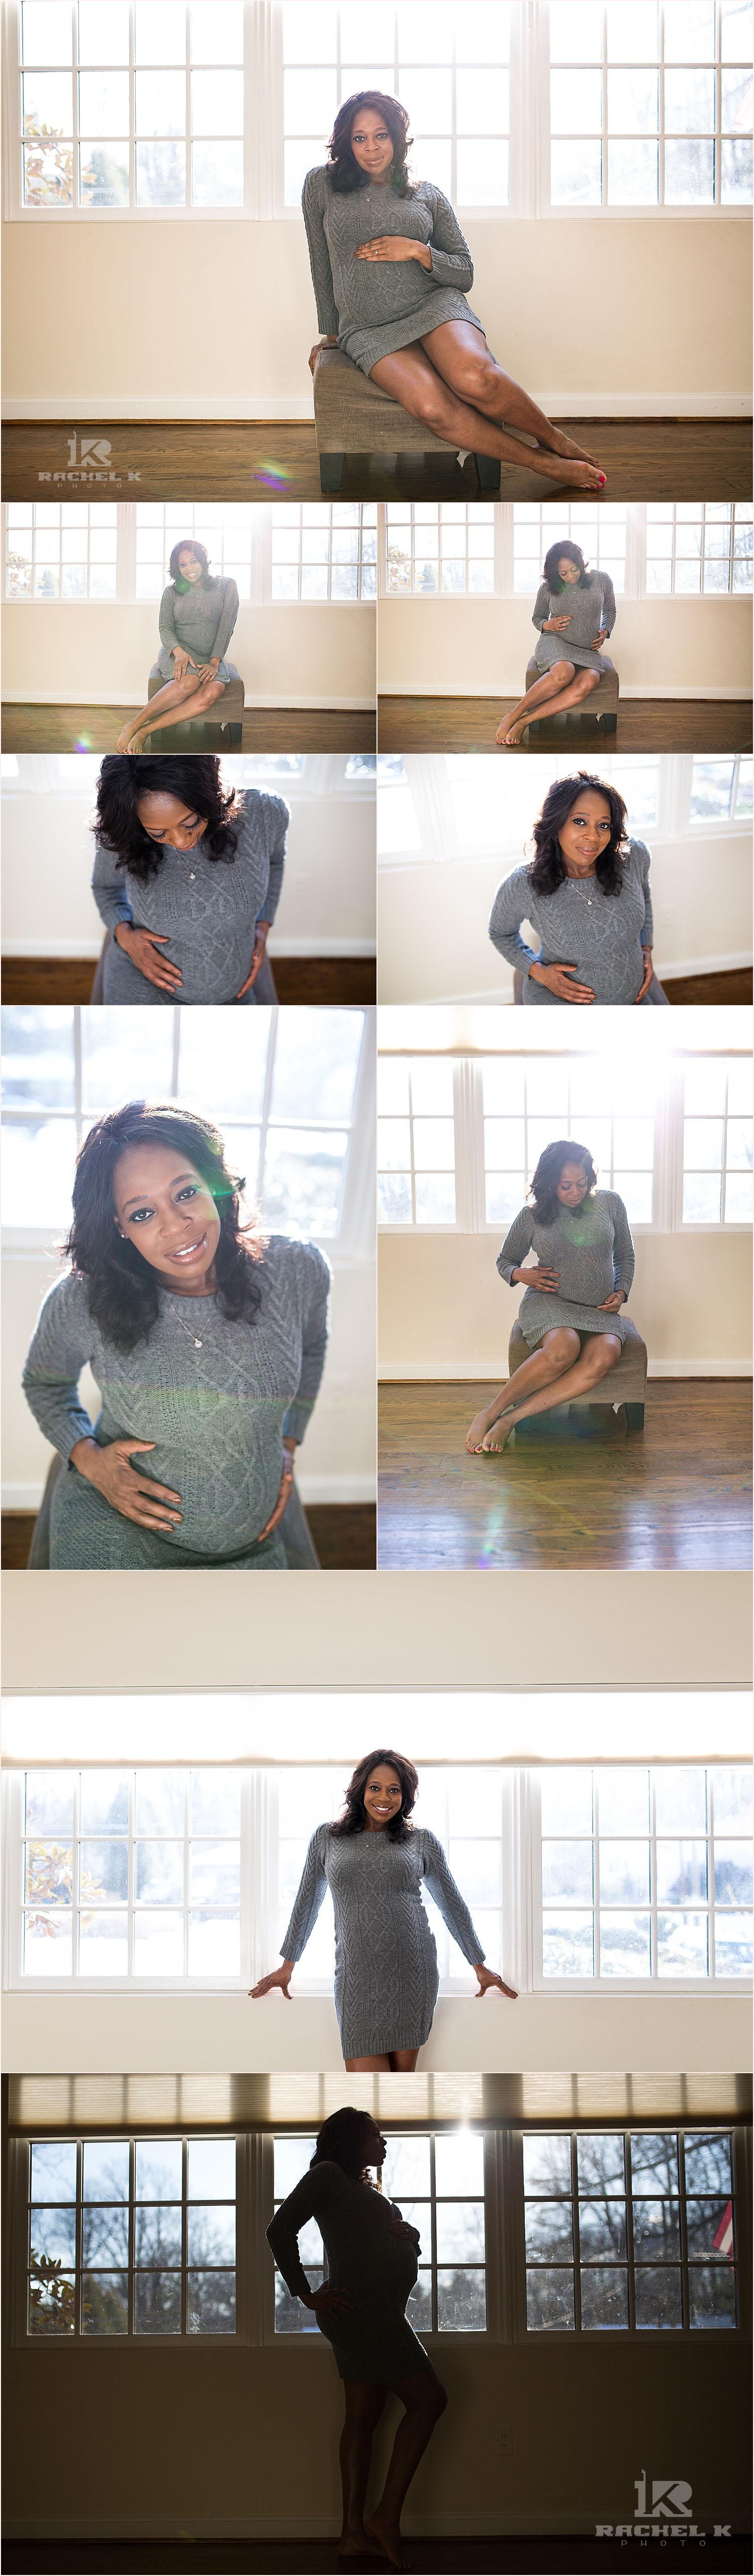 Arlington VA Indoor maternity session by Rachel K Photo